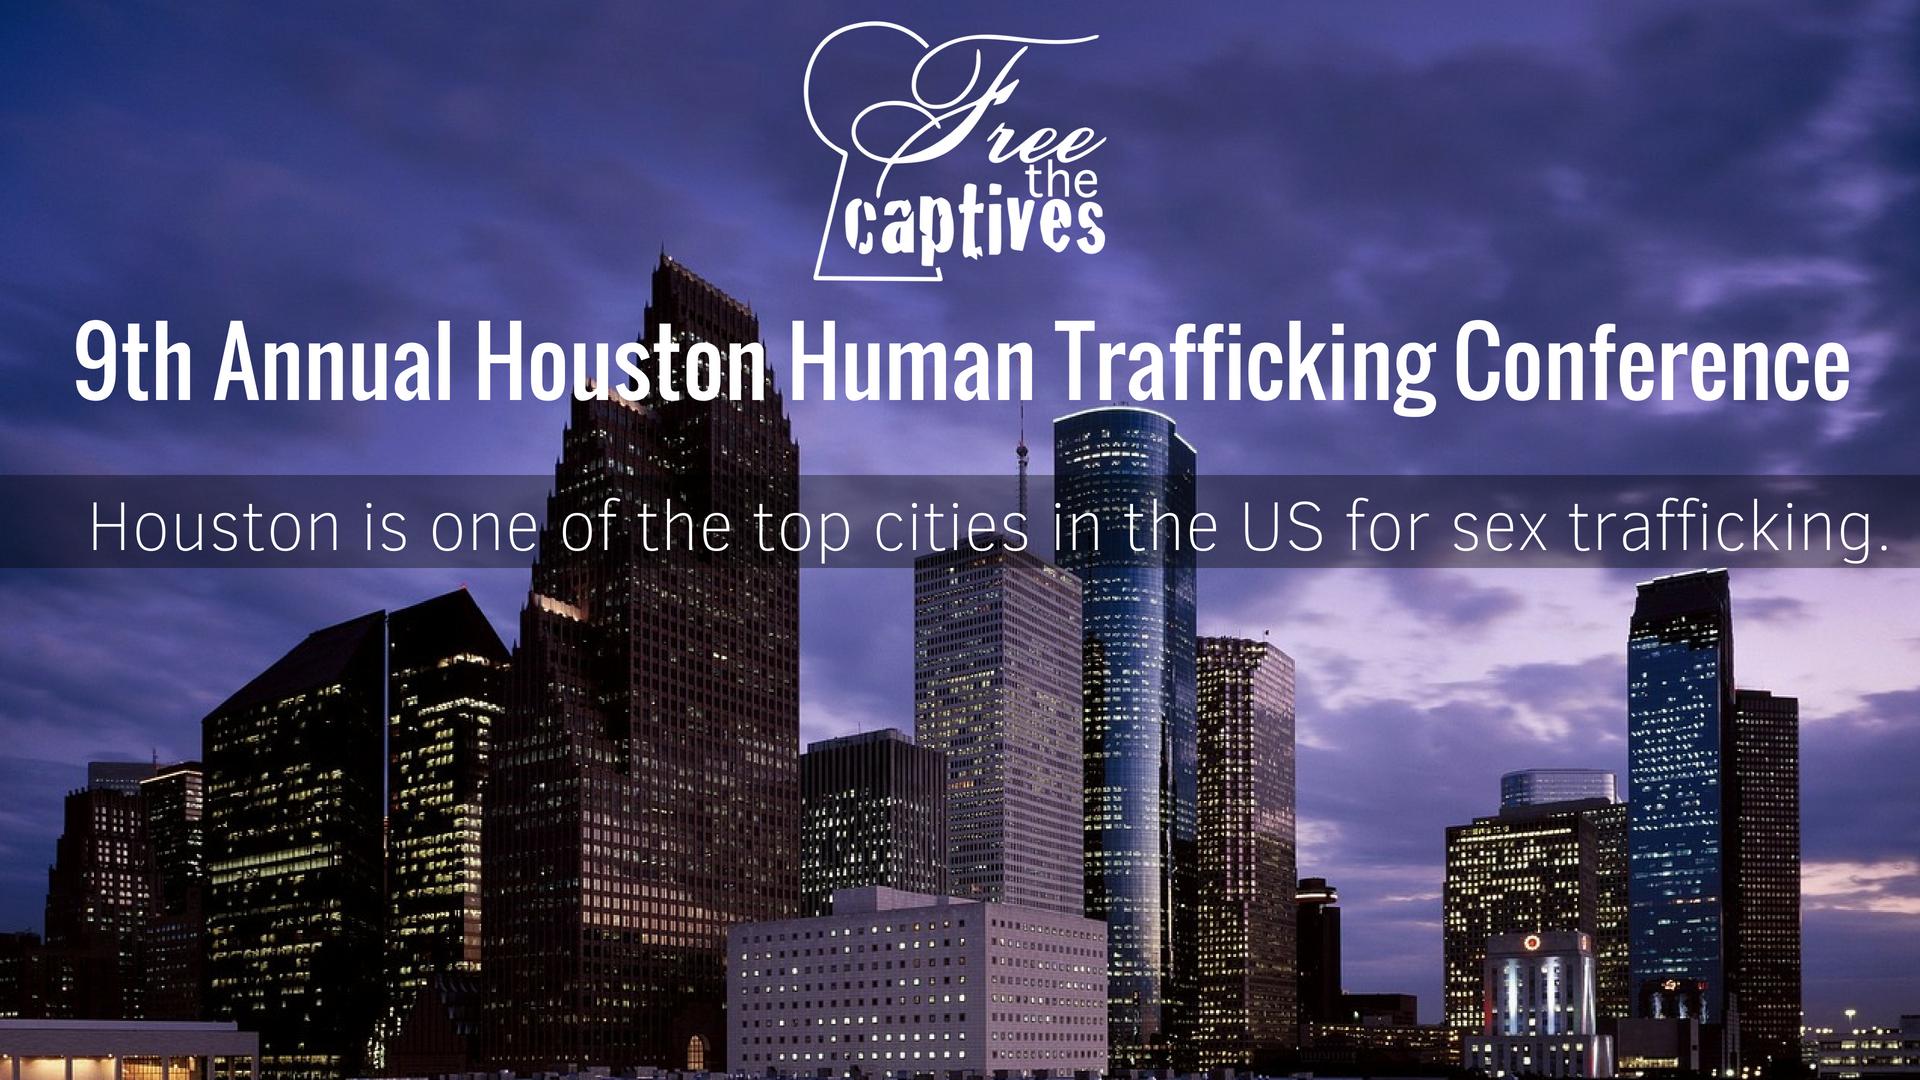 Houston Human Trafficking Conference - Free The Captives Houston